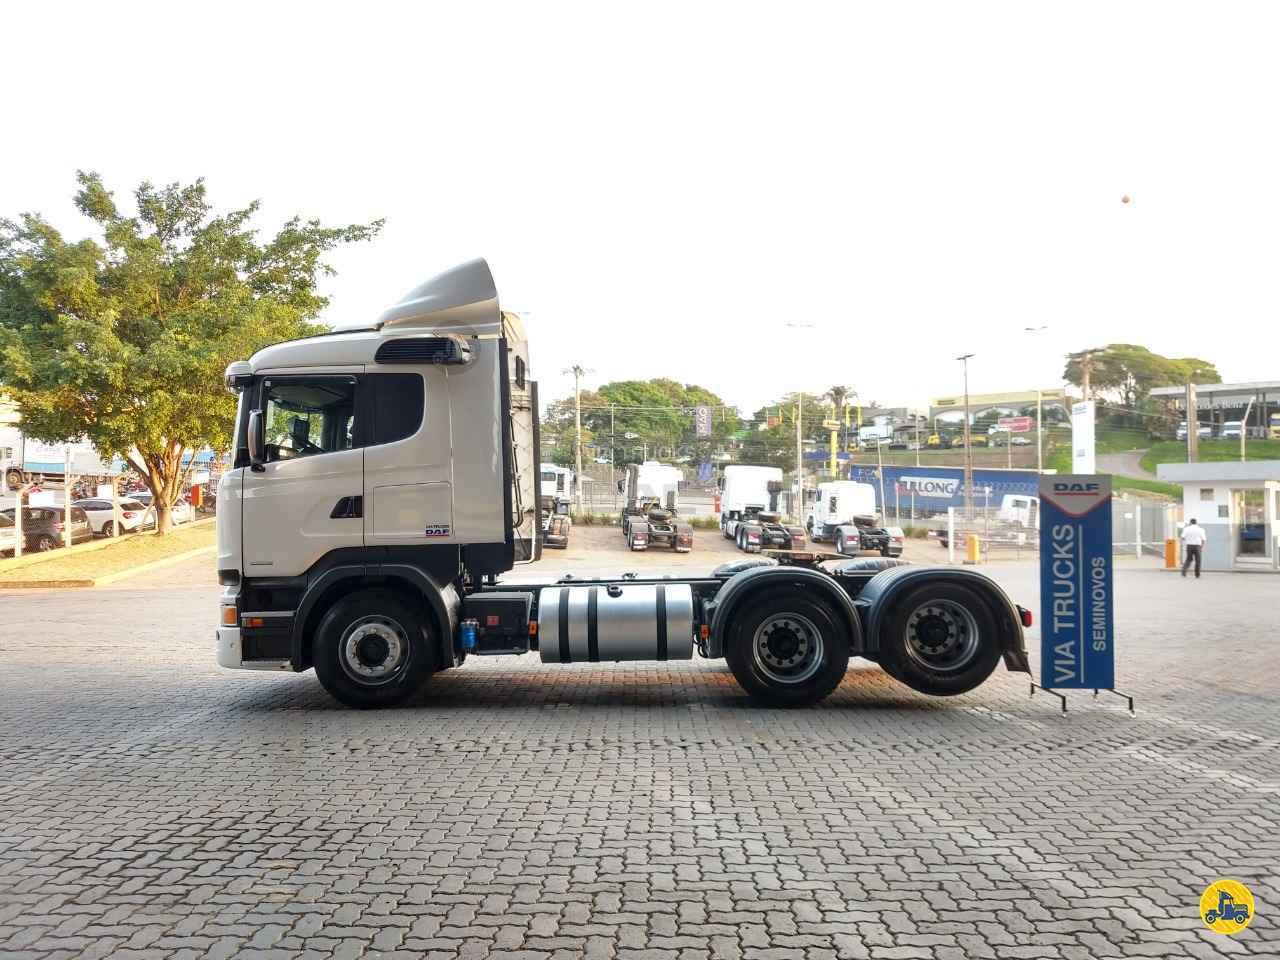 SCANIA SCANIA 400 615000km 2016/2016 Via Trucks - DAF